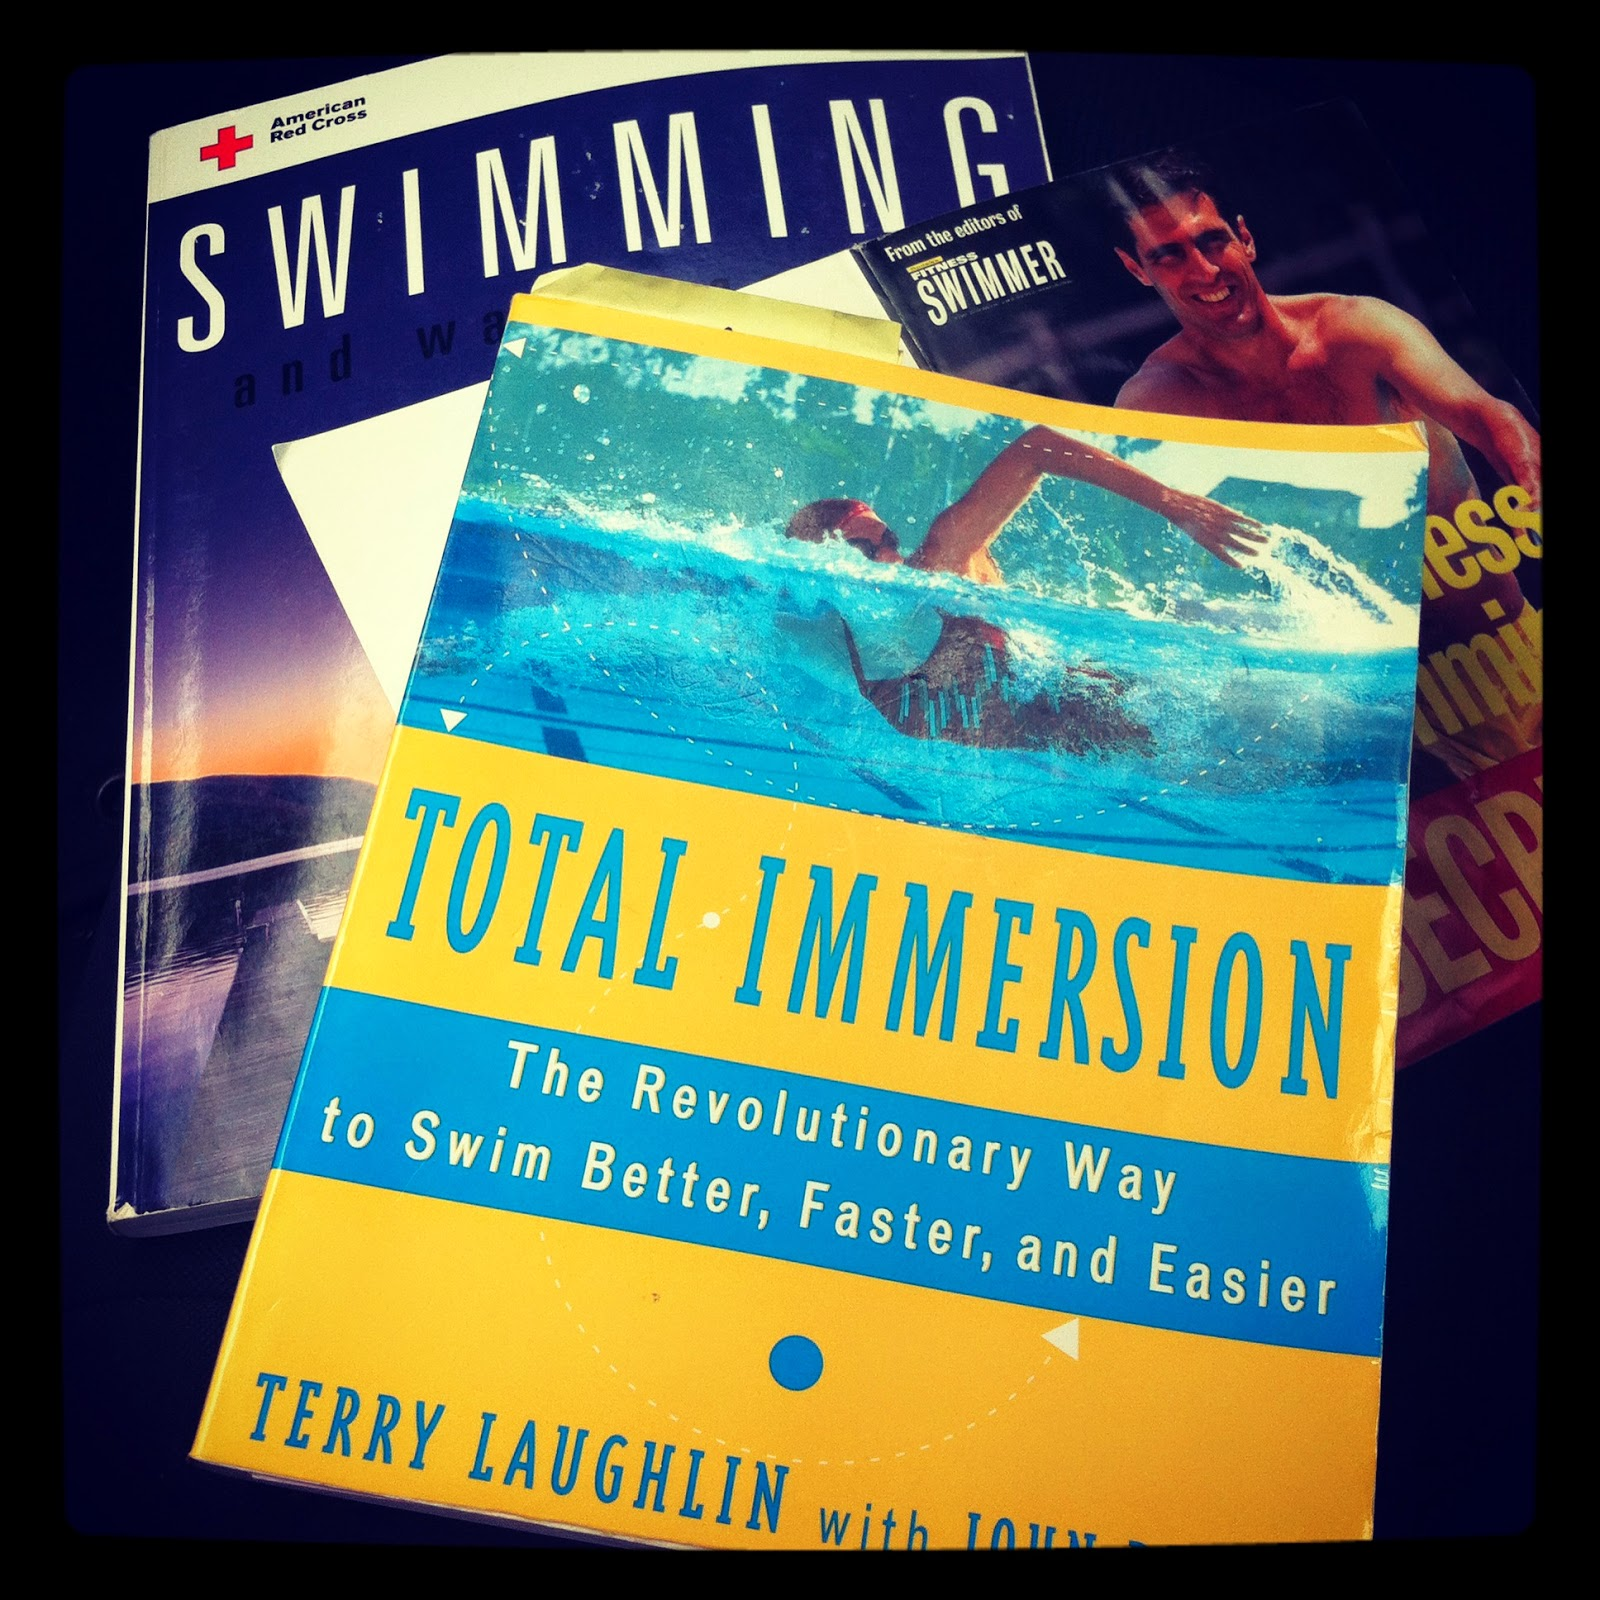 My Swim Essentials